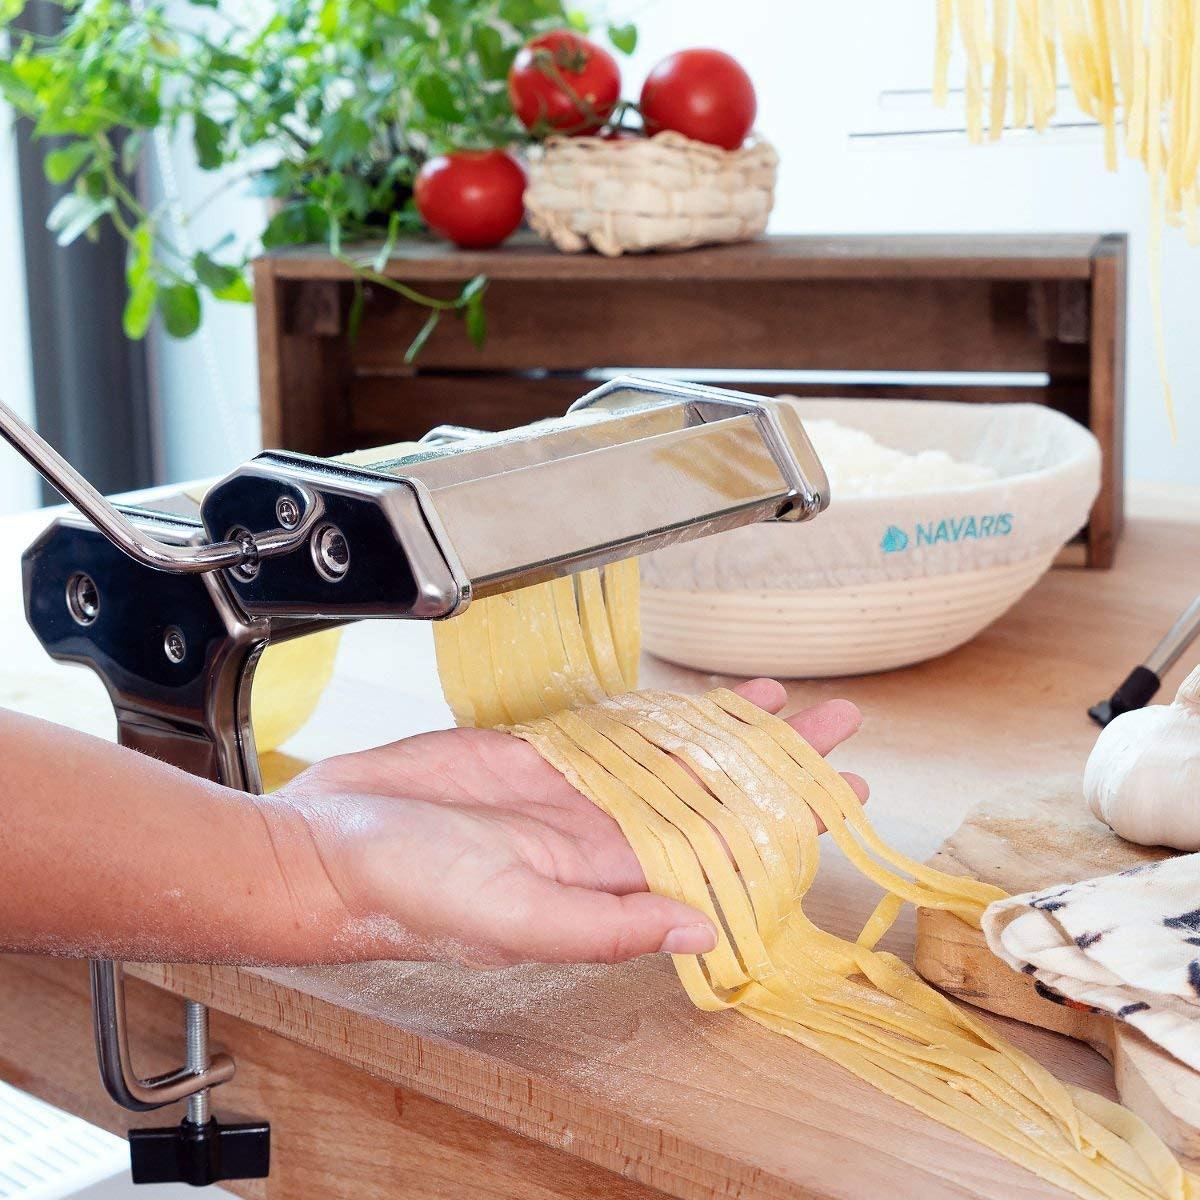 Navaris Pasta Maker